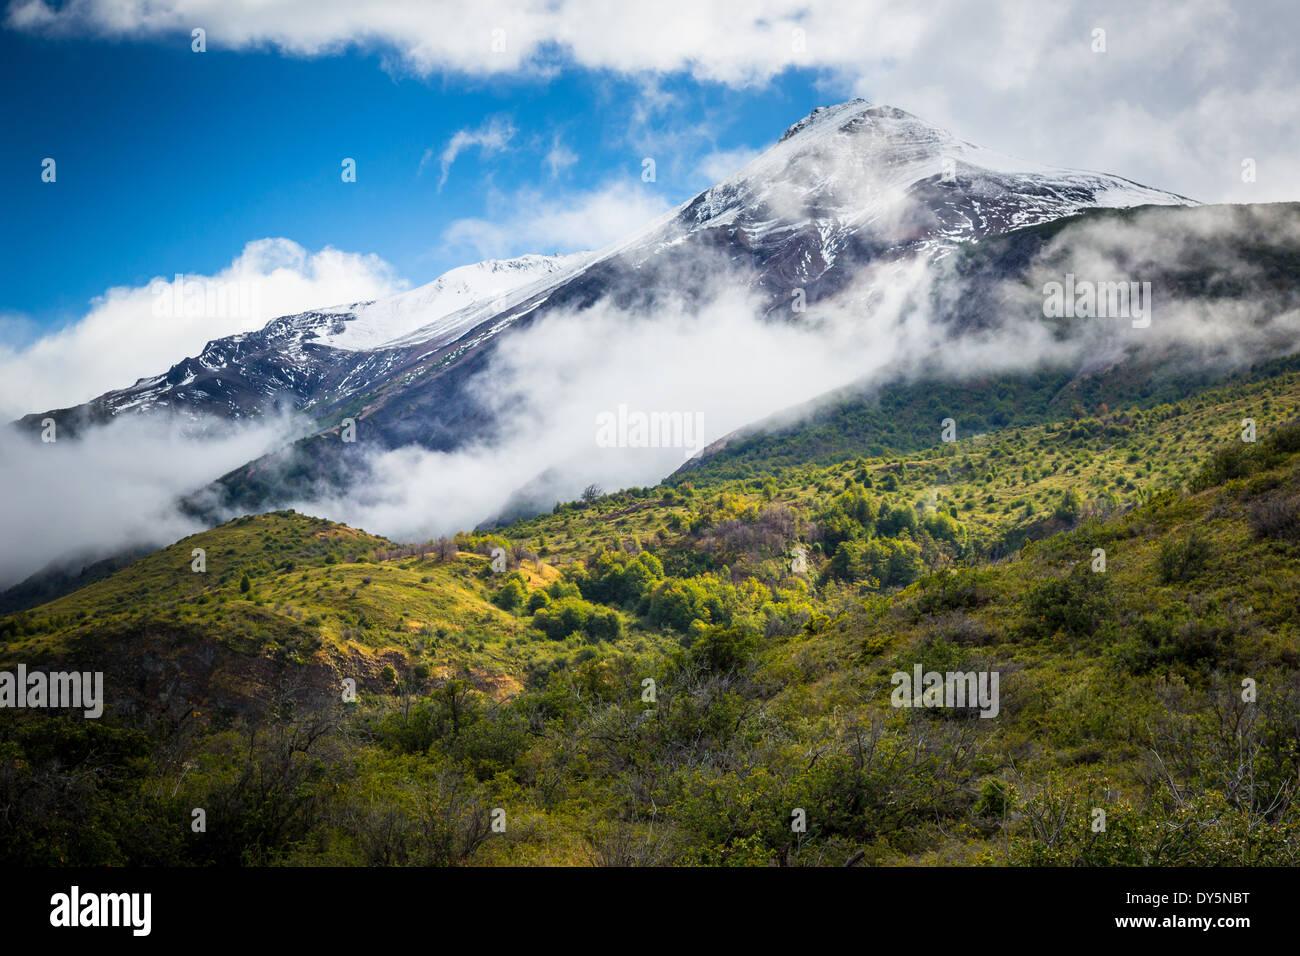 Mountain peak near the Los Glaciares National Park in Patagonia, Argentina - Stock Image